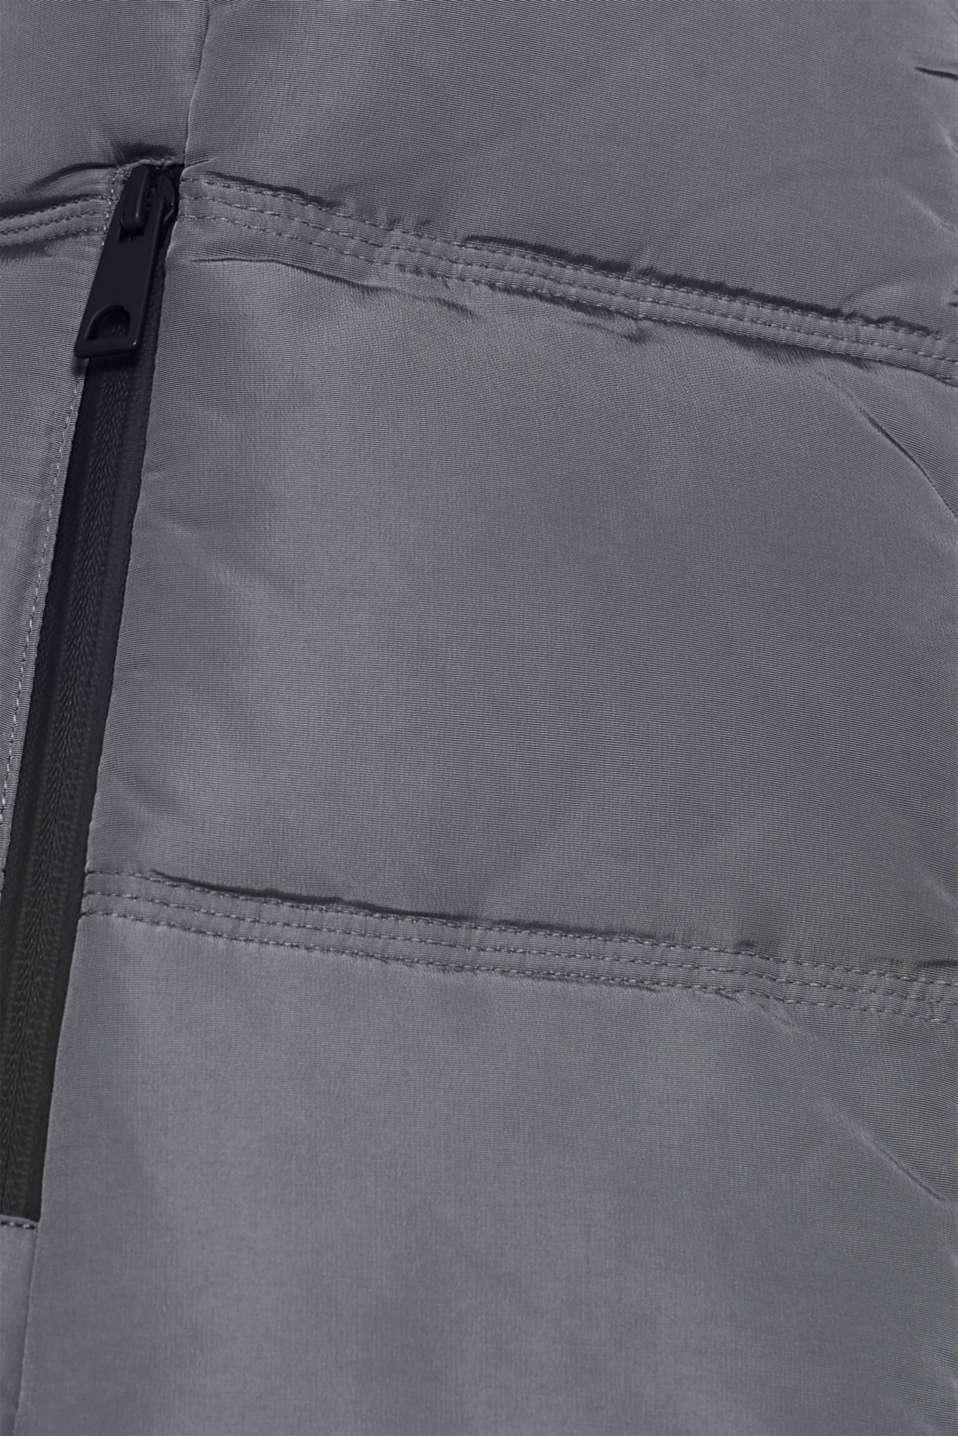 Jackets outdoor woven, DARK GREY, detail image number 4